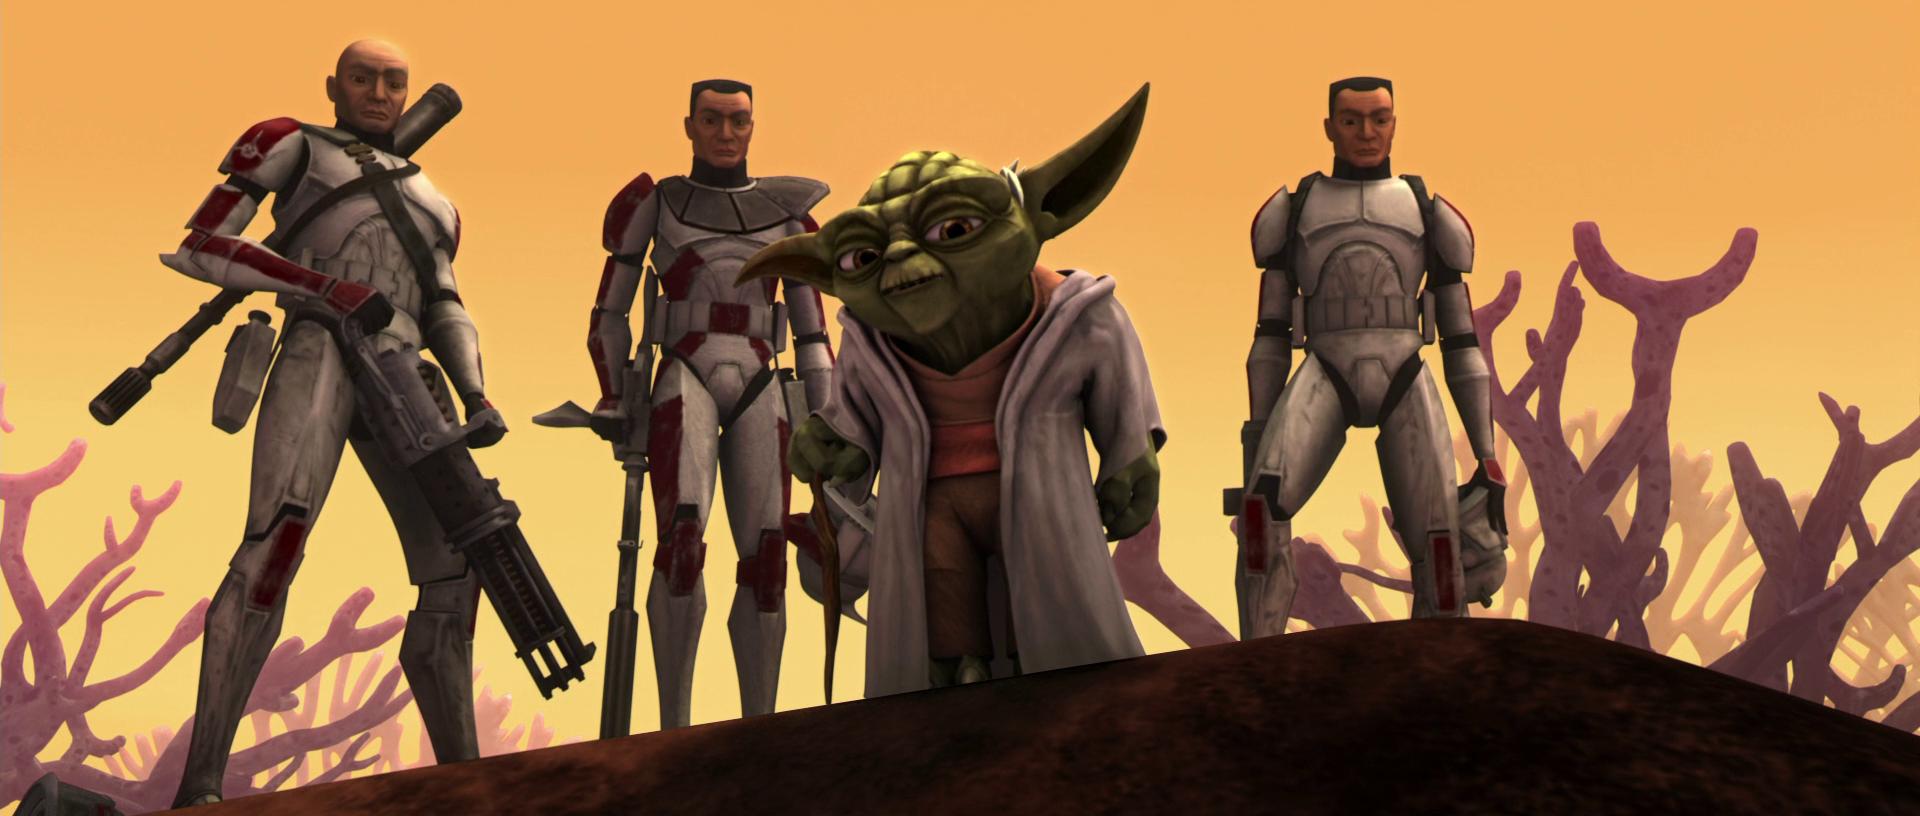 Ambush_Yoda_clones.png